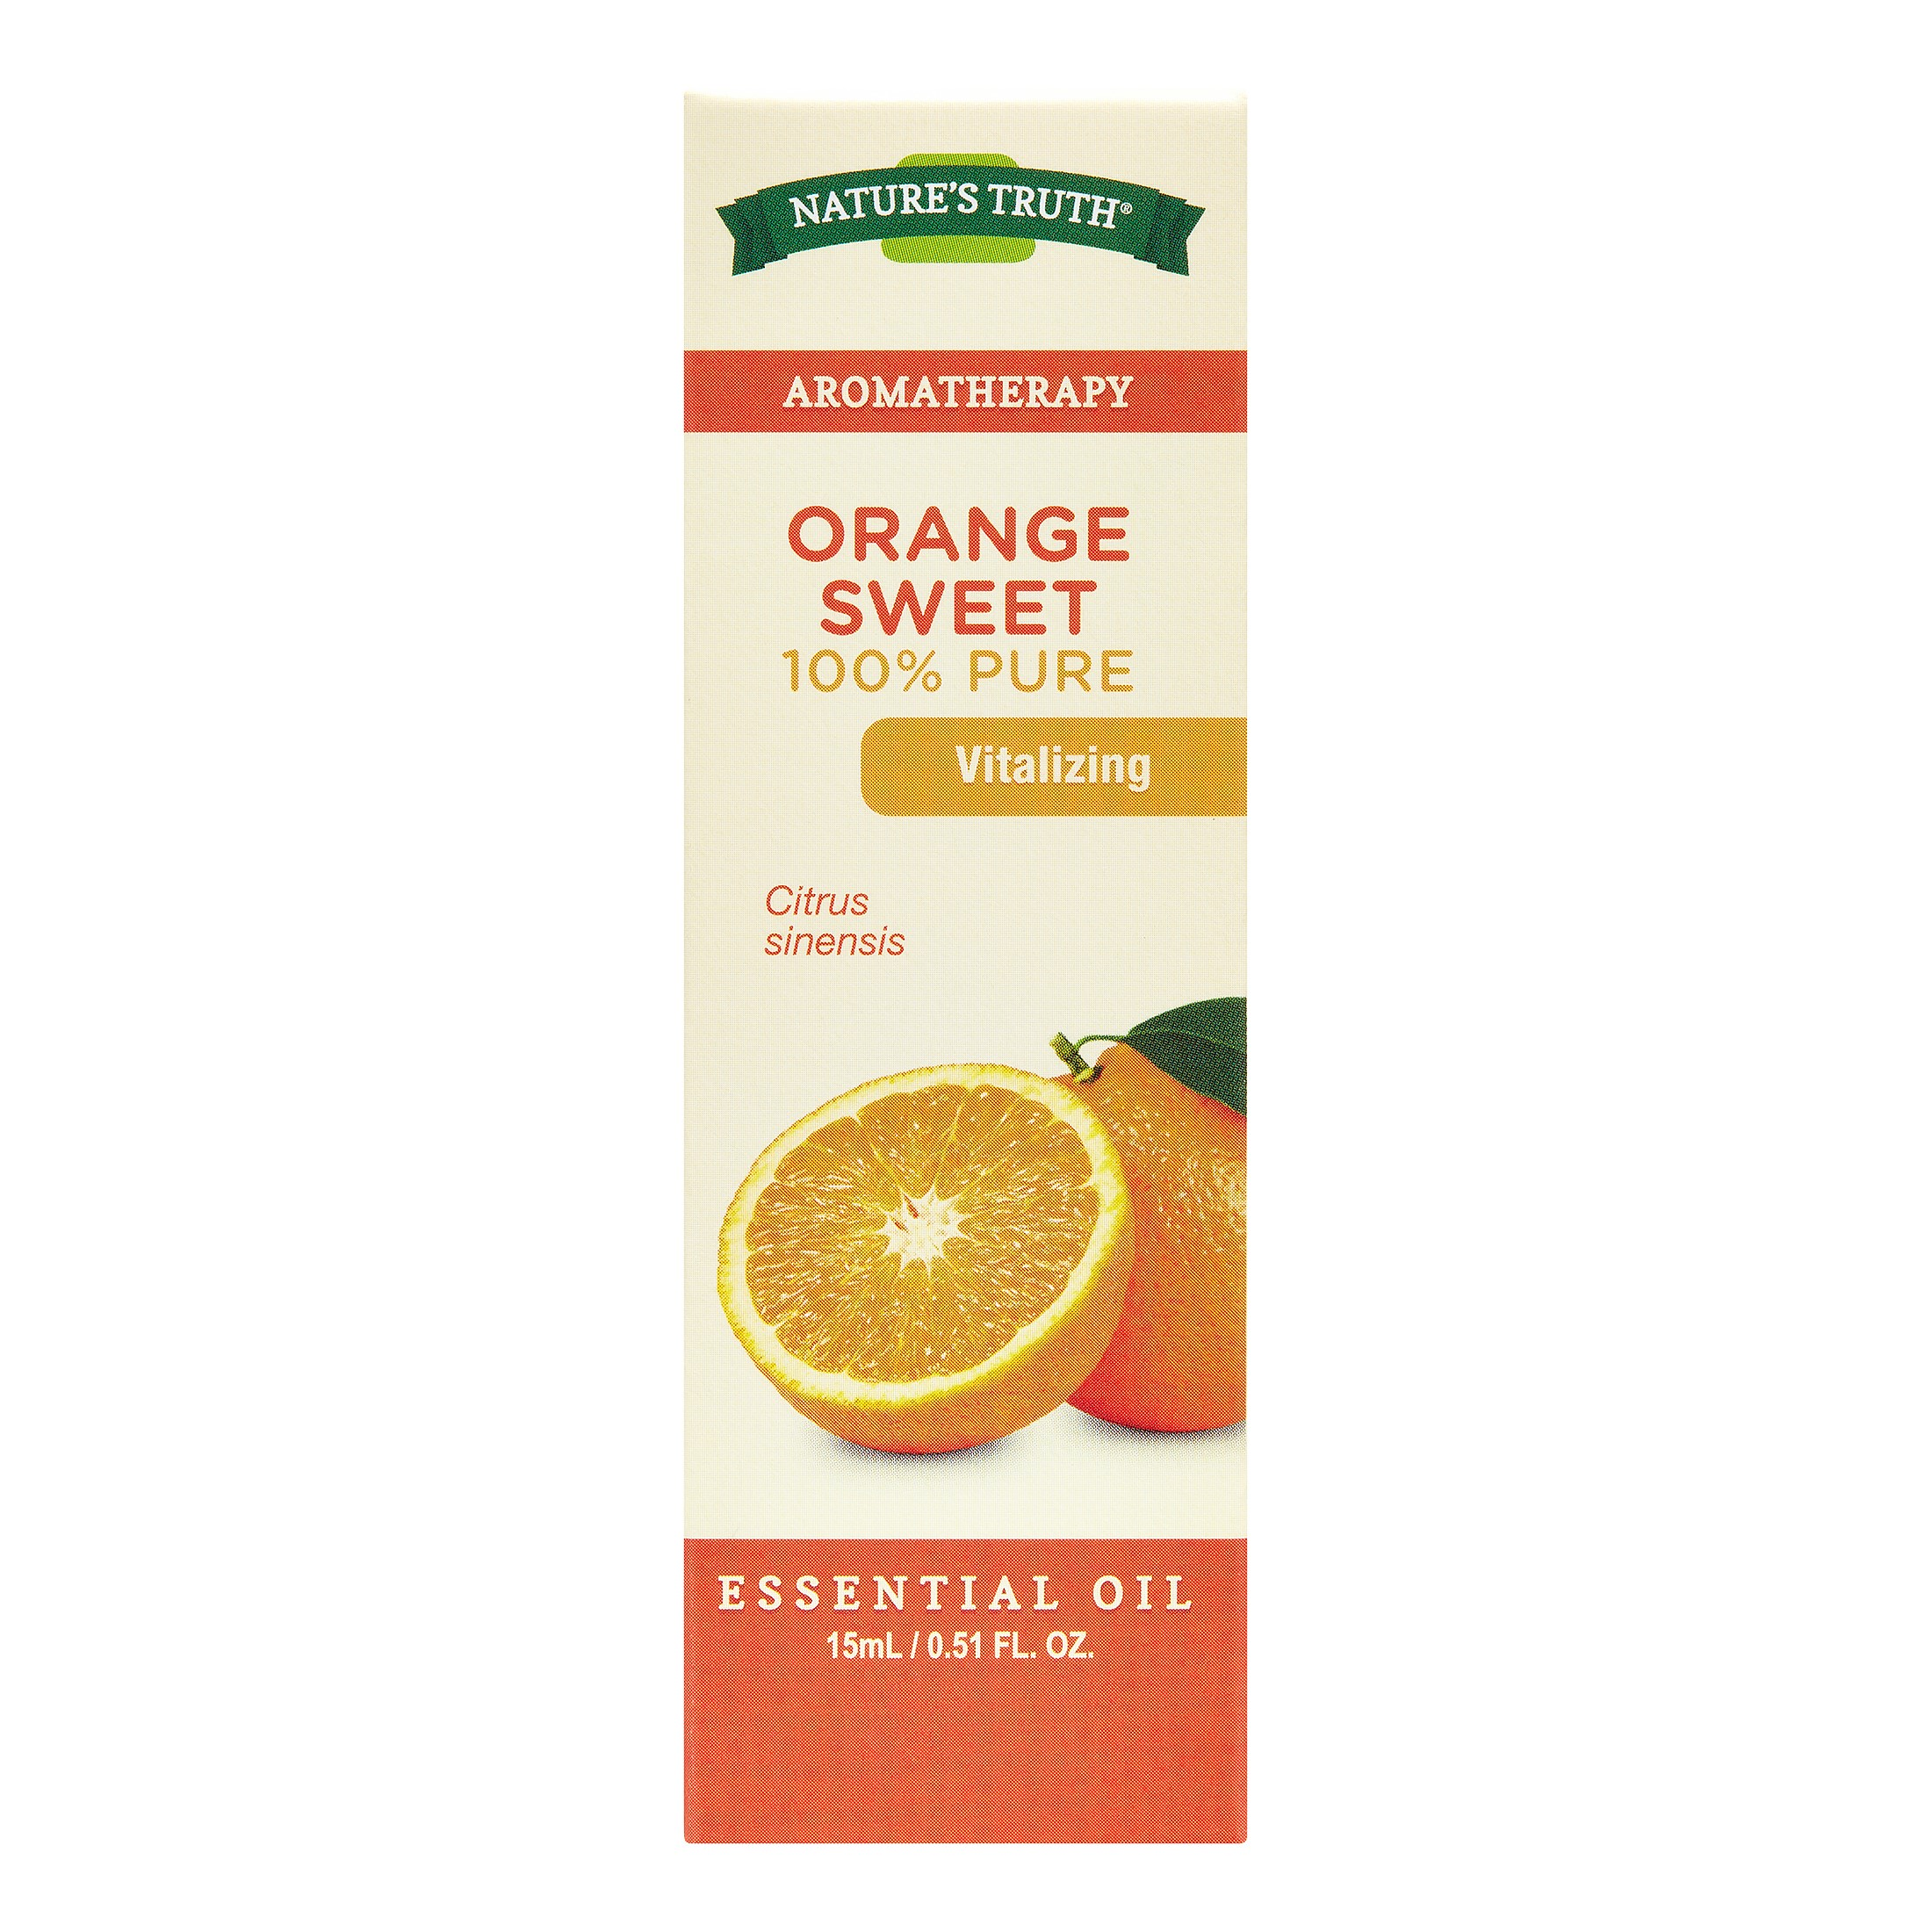 Nature's Truth Aromatherapy Orange Sweet Essential Oil, 0.51 Fl Oz